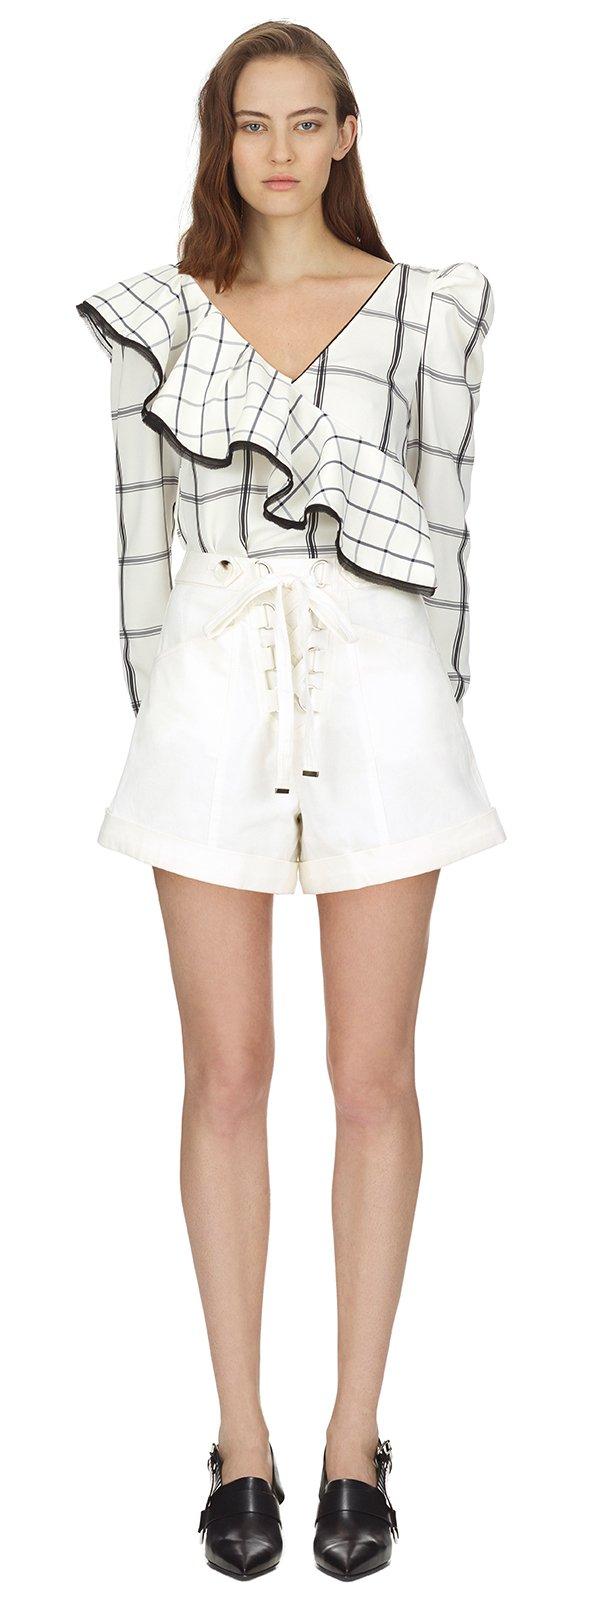 sp18-102-01-Tie Front Canvas Shorts.jpg